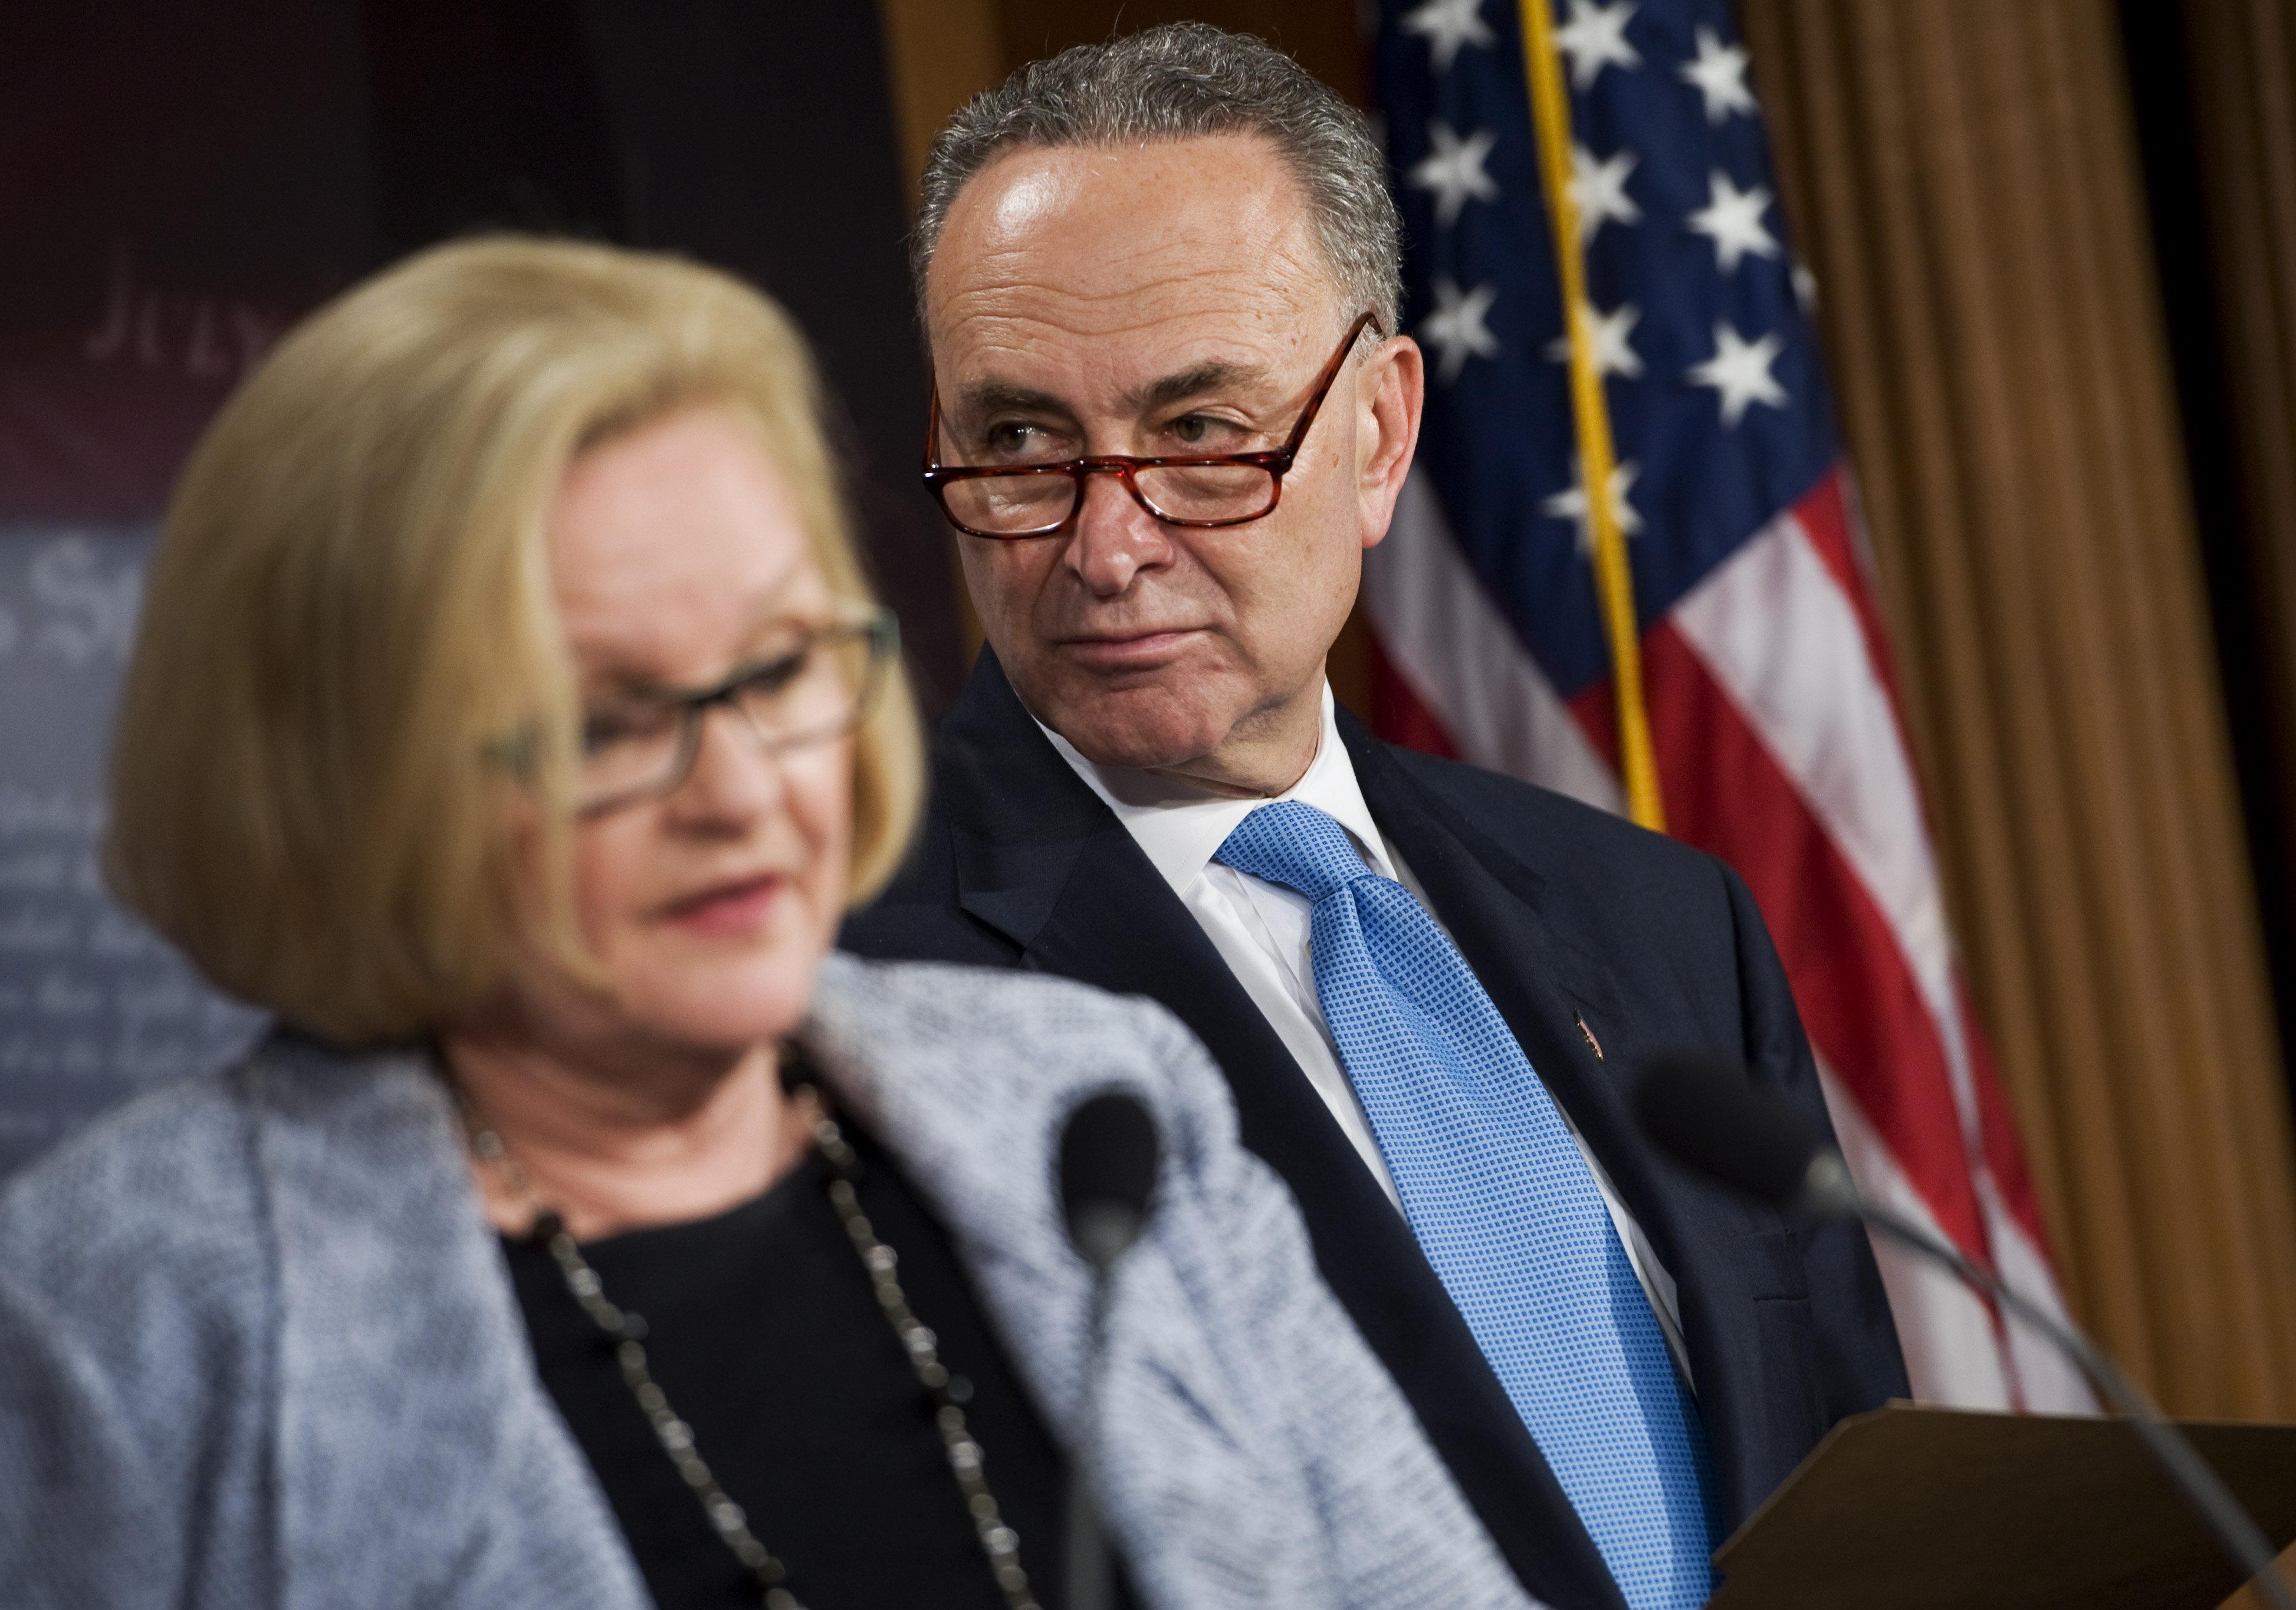 Democratic Sens. Claire McCaskill (Mo.) and Chuck Schumer (N.Y.).